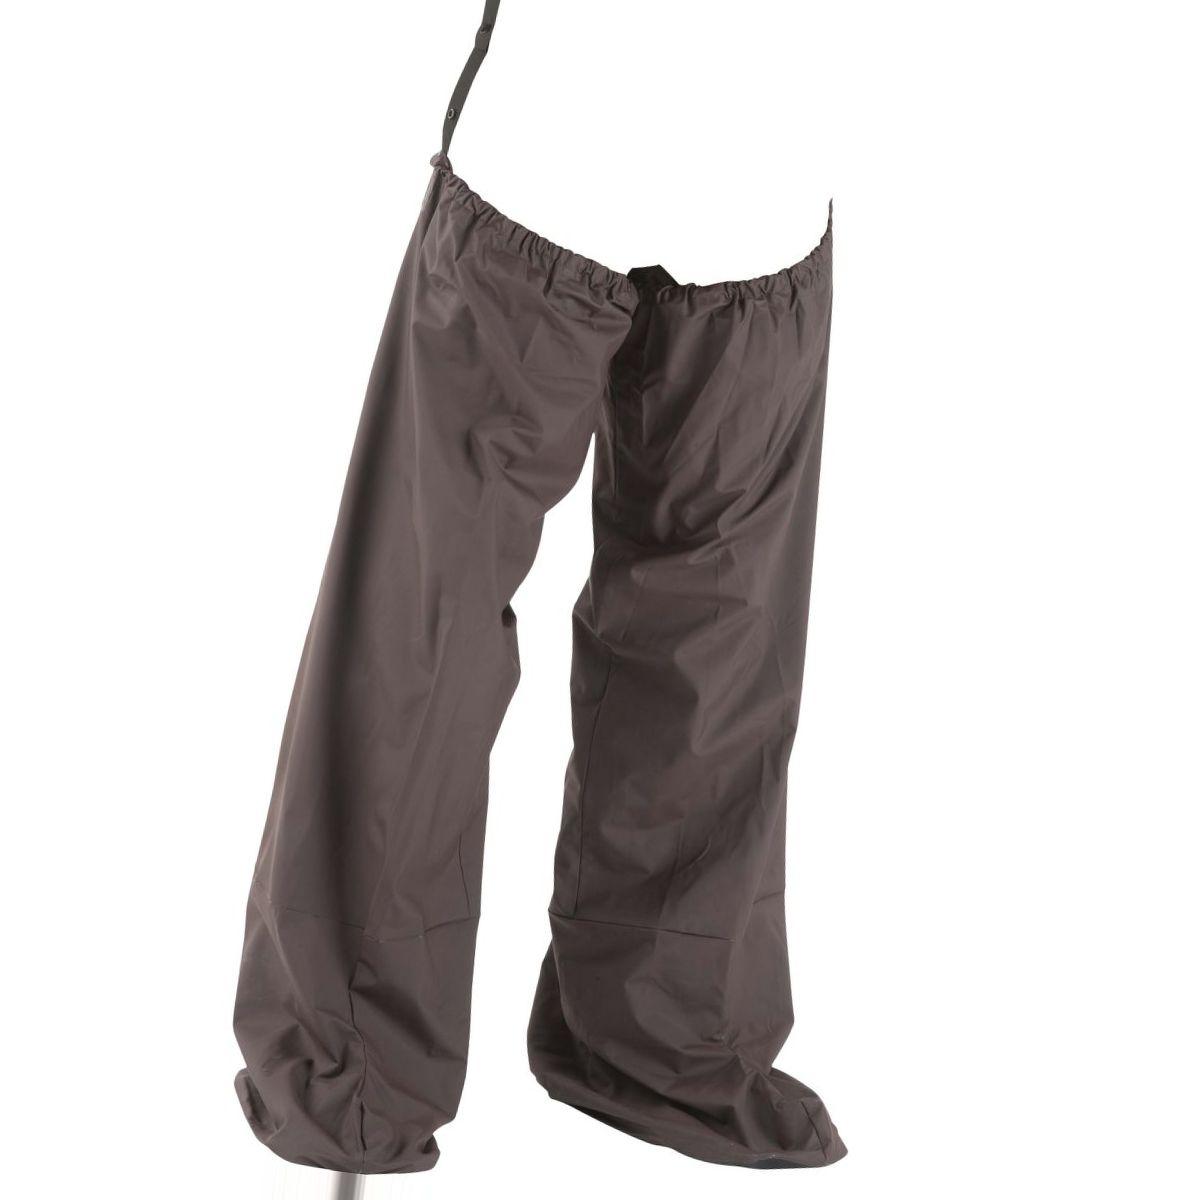 Hodgman® Men's Gamewade Packable Hip Waders